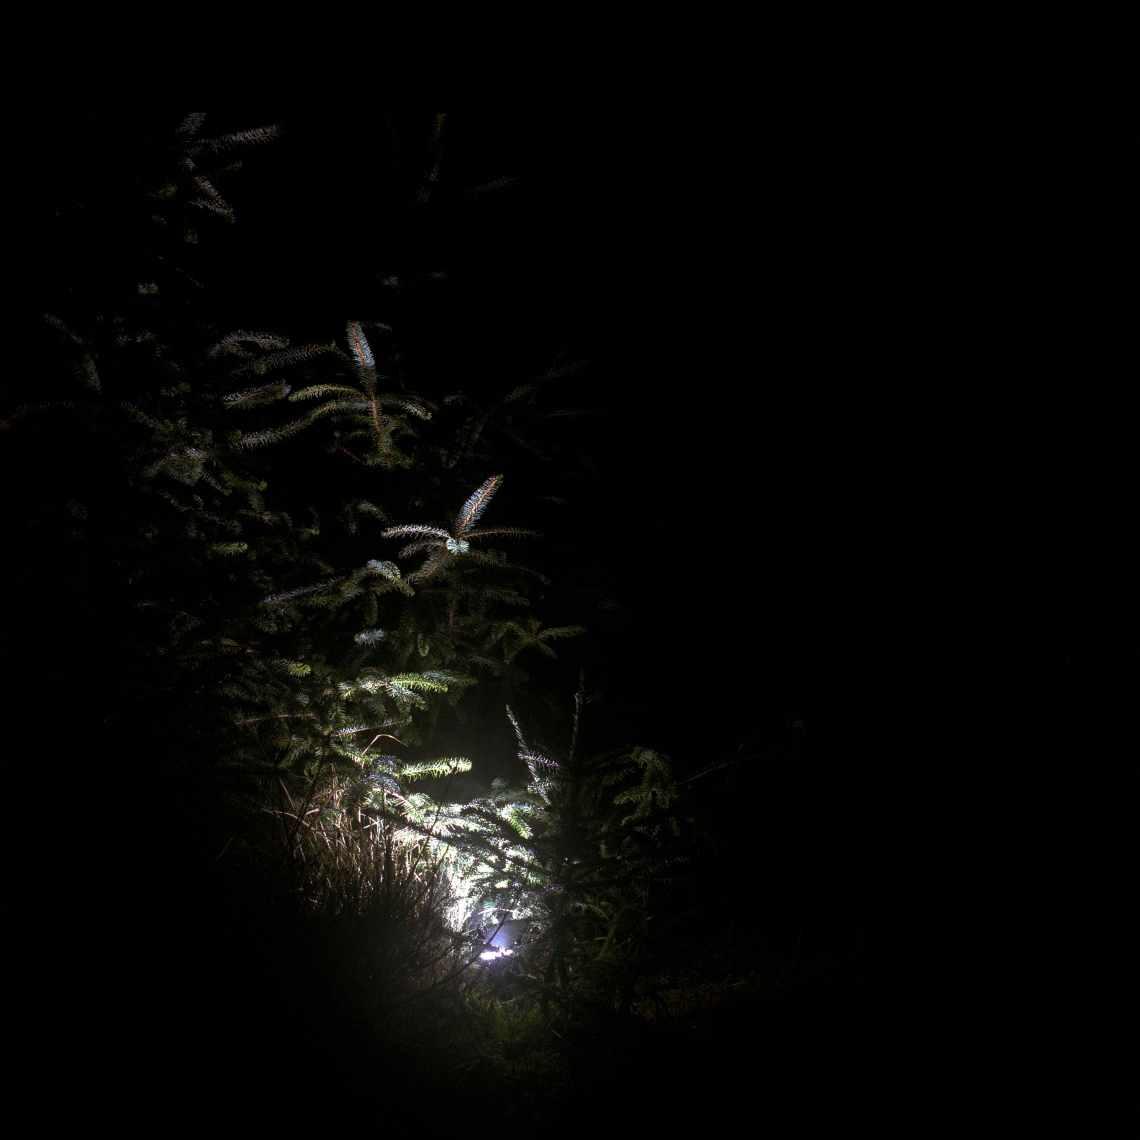 light_2-epson